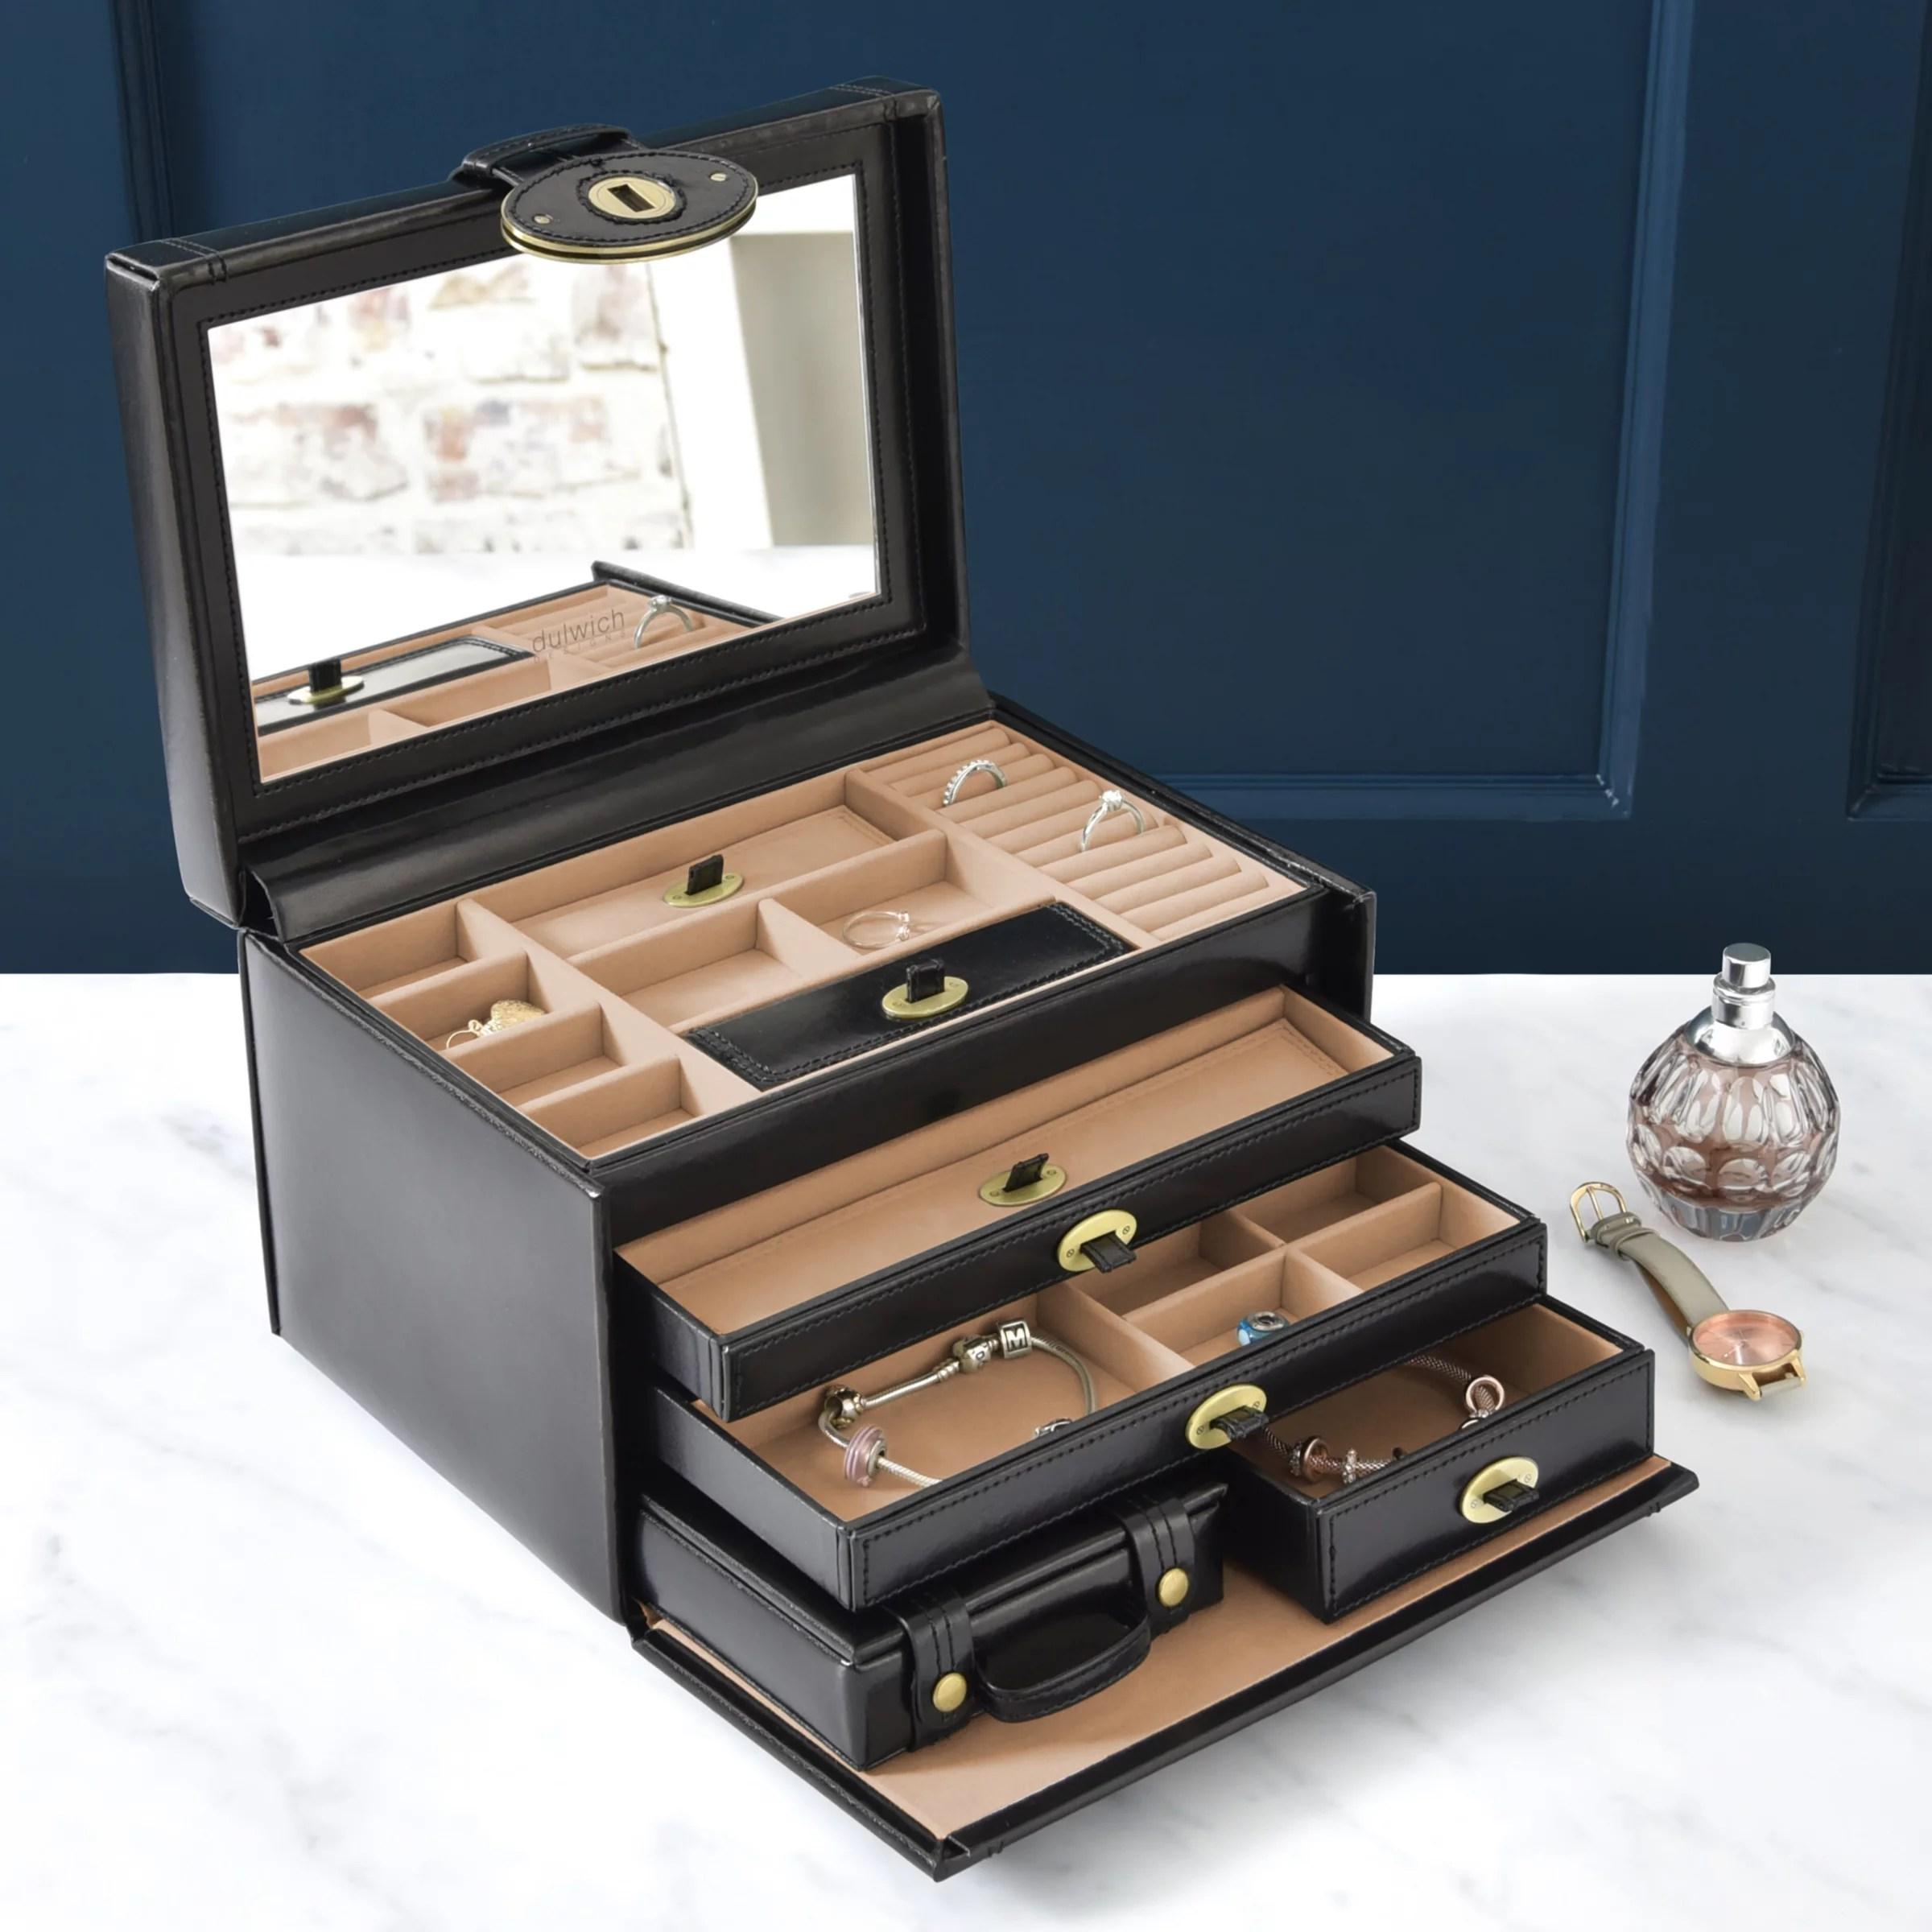 Jewelery Box Designs : jewelery, designs, Dulwich, Designs, Heritage, Large, Jewellery, Black, Lewis, Partners